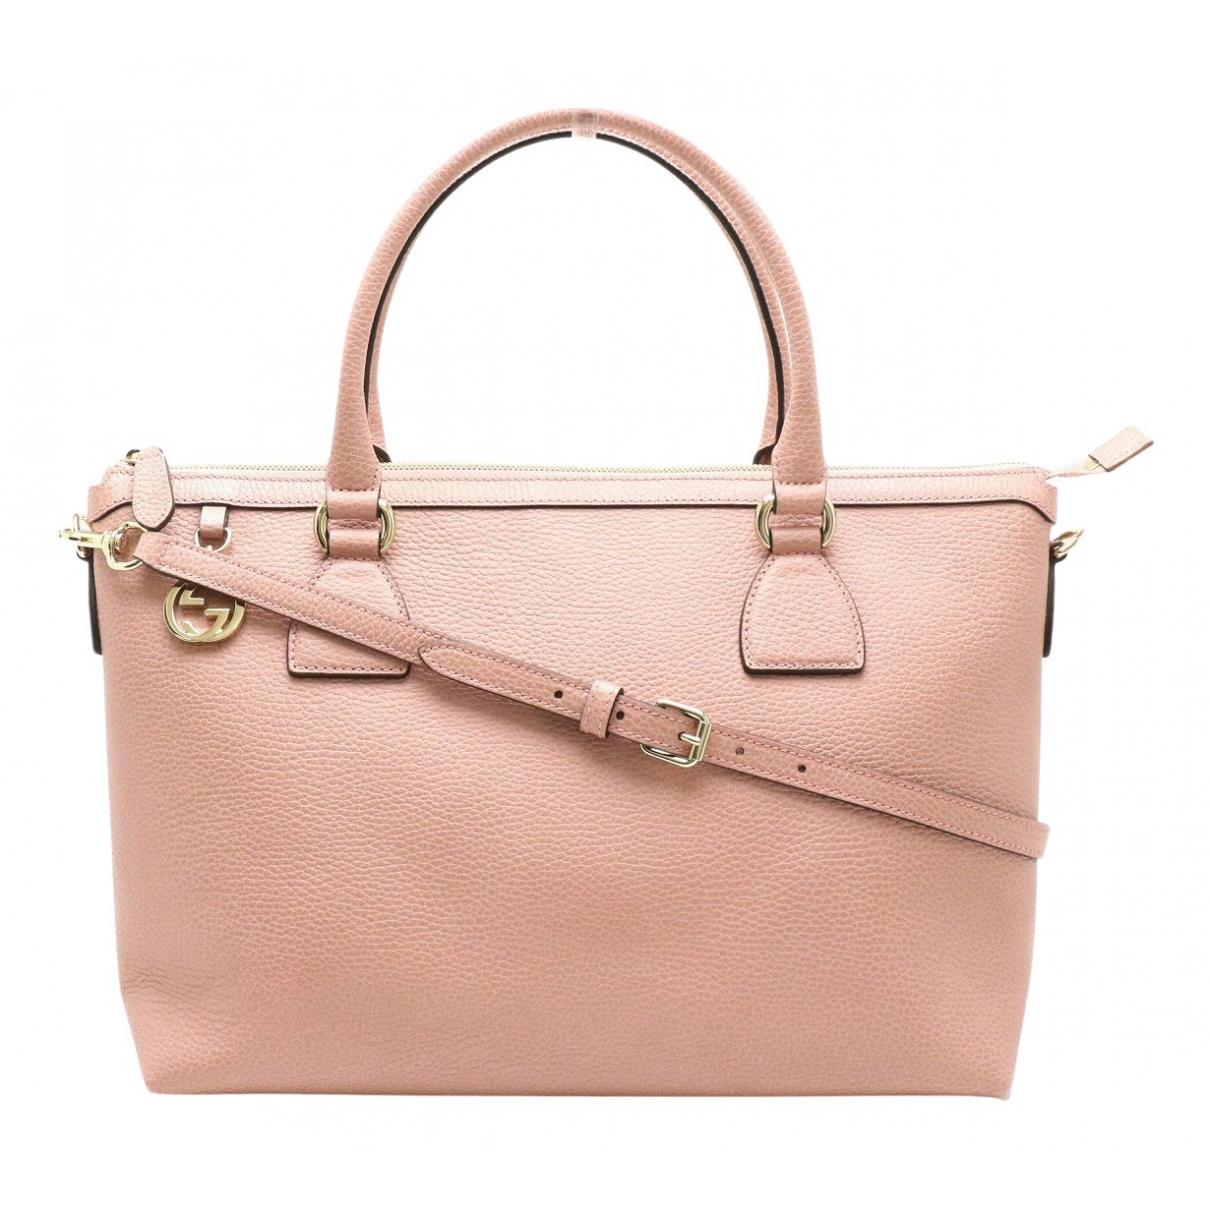 Gucci N Pink Leather handbag for Women N